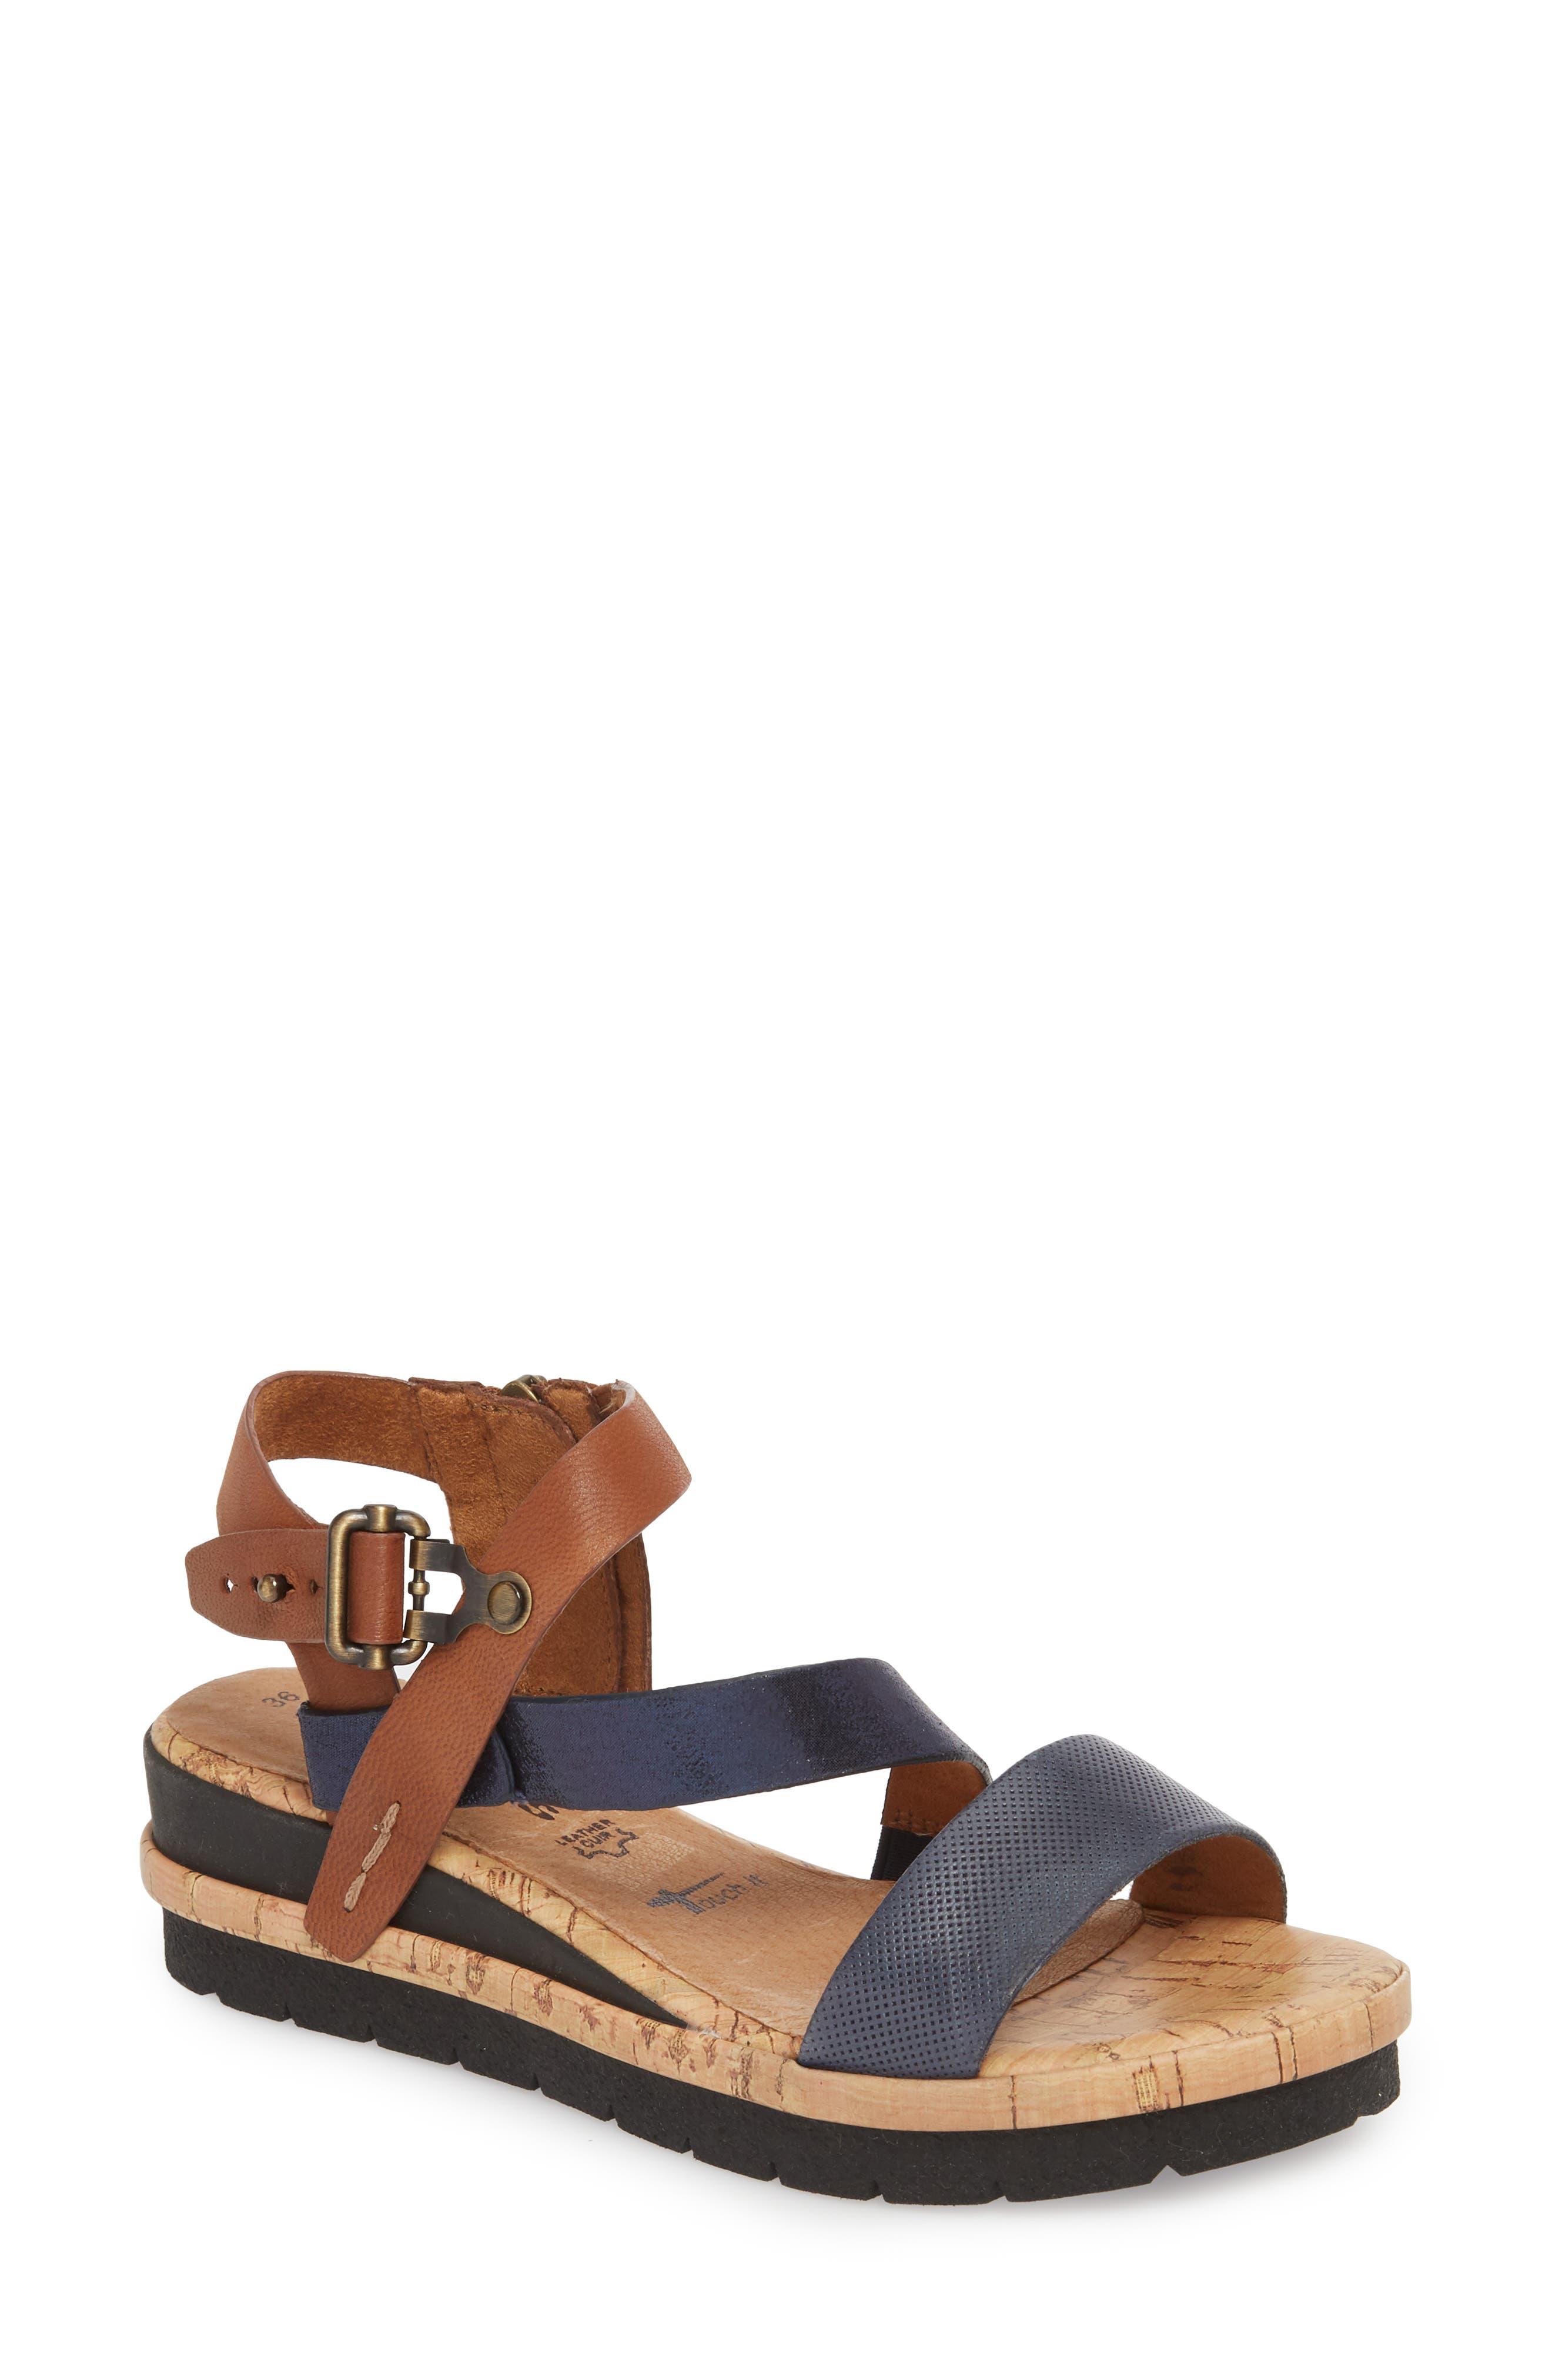 Eda Diagonal Strap Wedge Sandal,                             Main thumbnail 1, color,                             Navy/ Cognac Leather